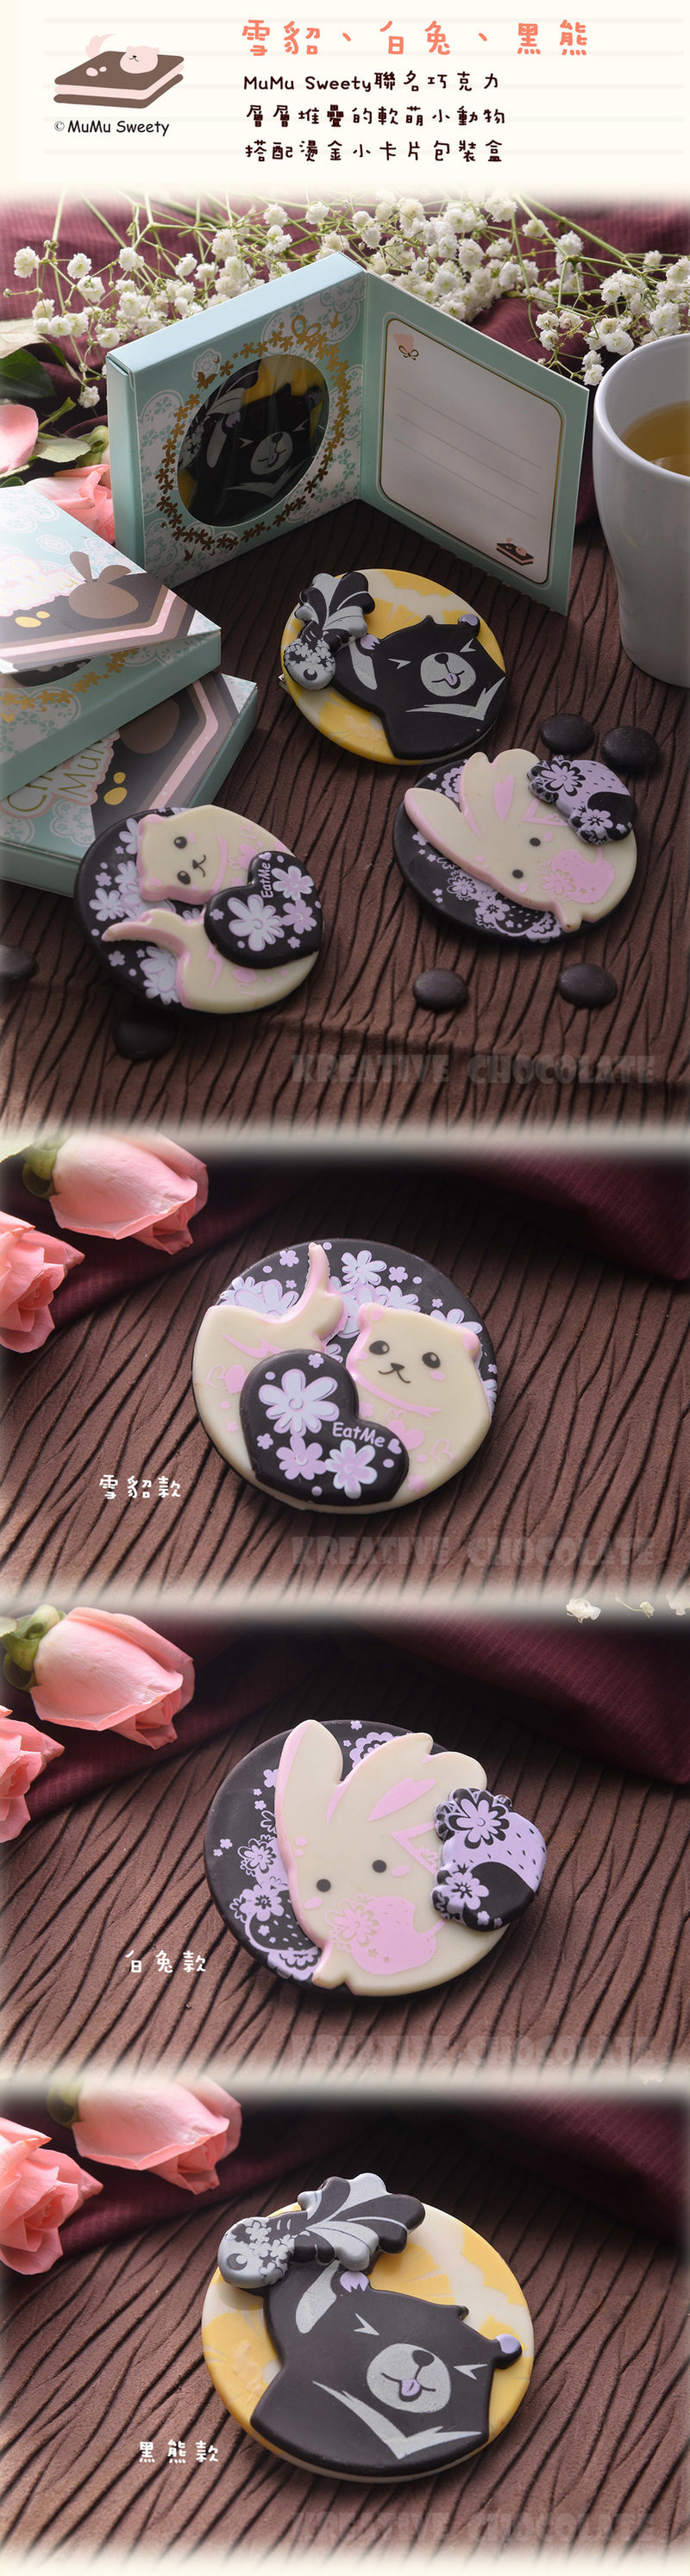 MuMu SweetyX壞唇-聯名巧克力作品